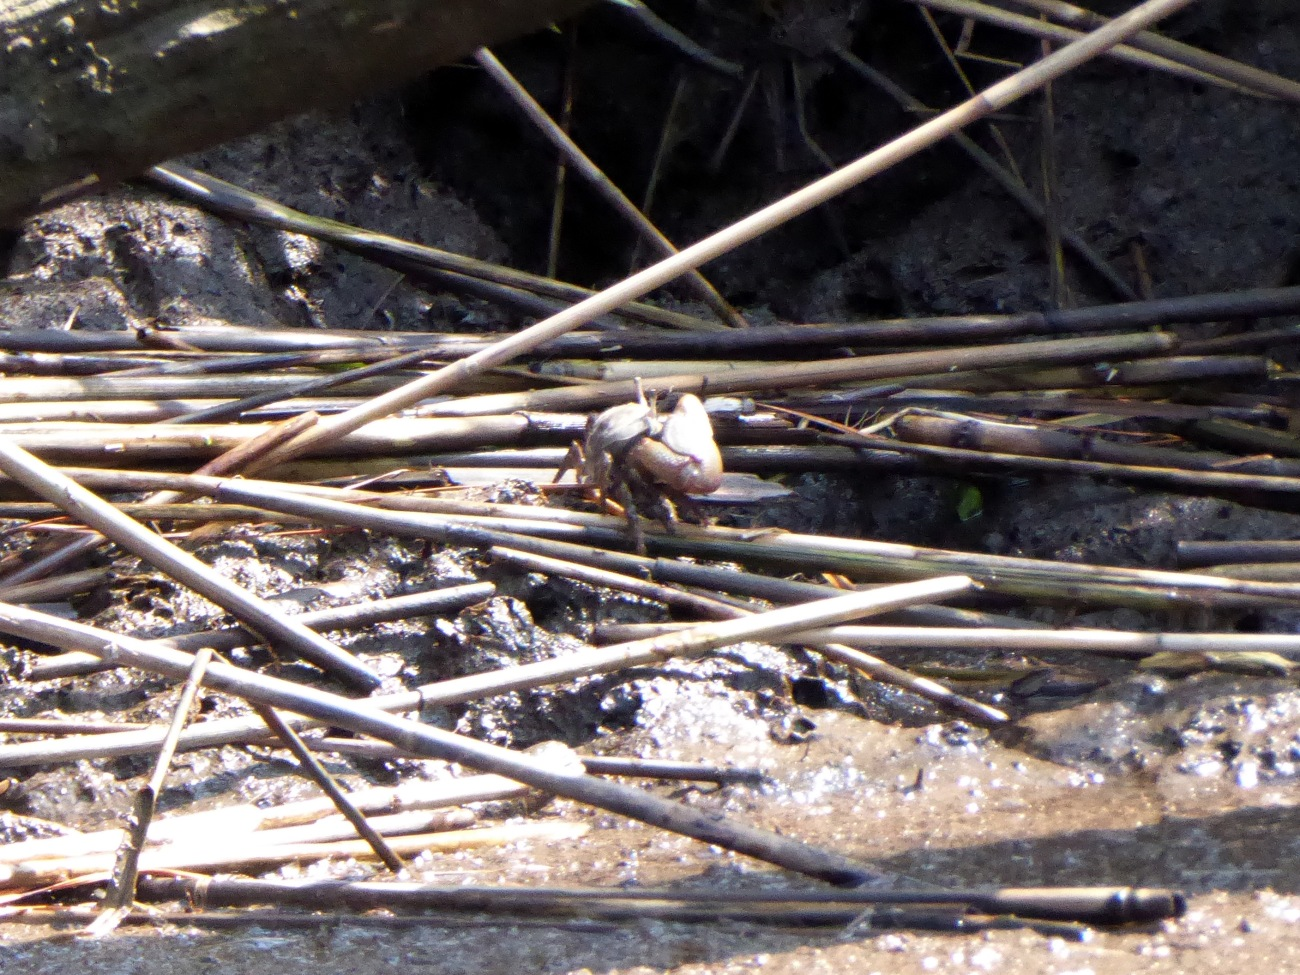 20170826_114412_Fiddler Crab along the shore